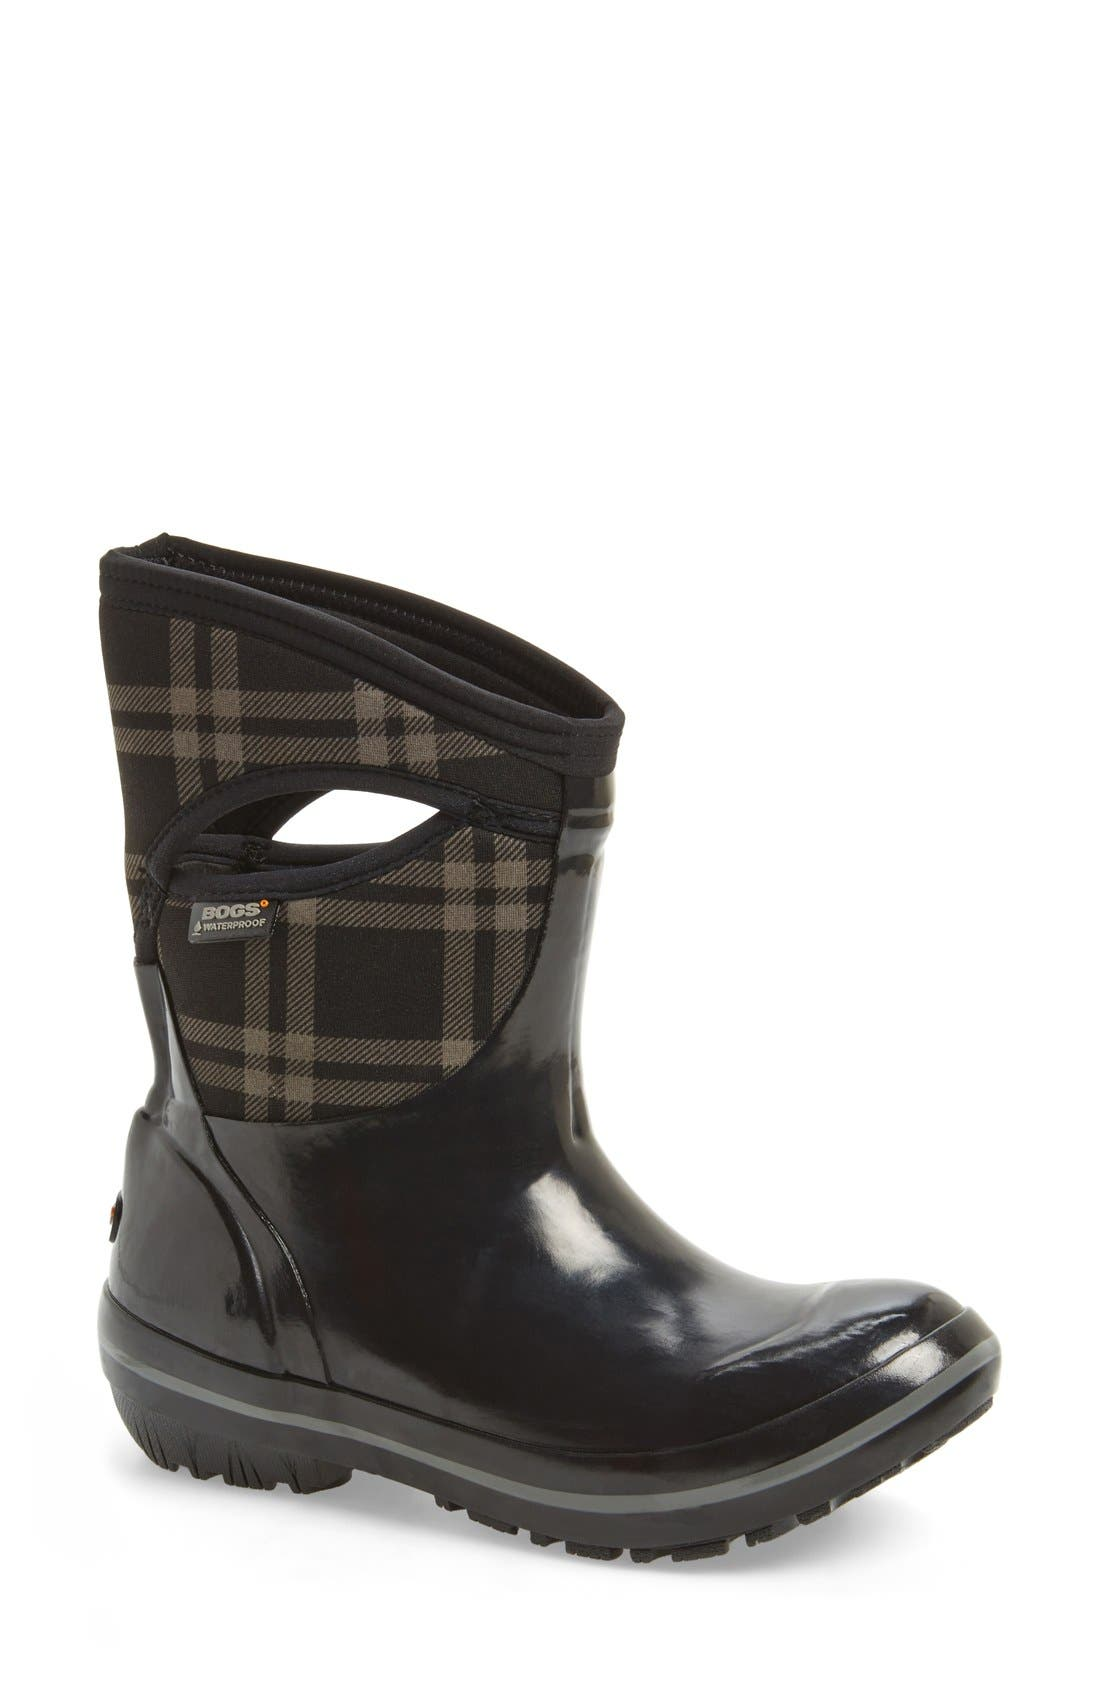 'Plimsoll Plaid' Mid Waterproof Snow Boot